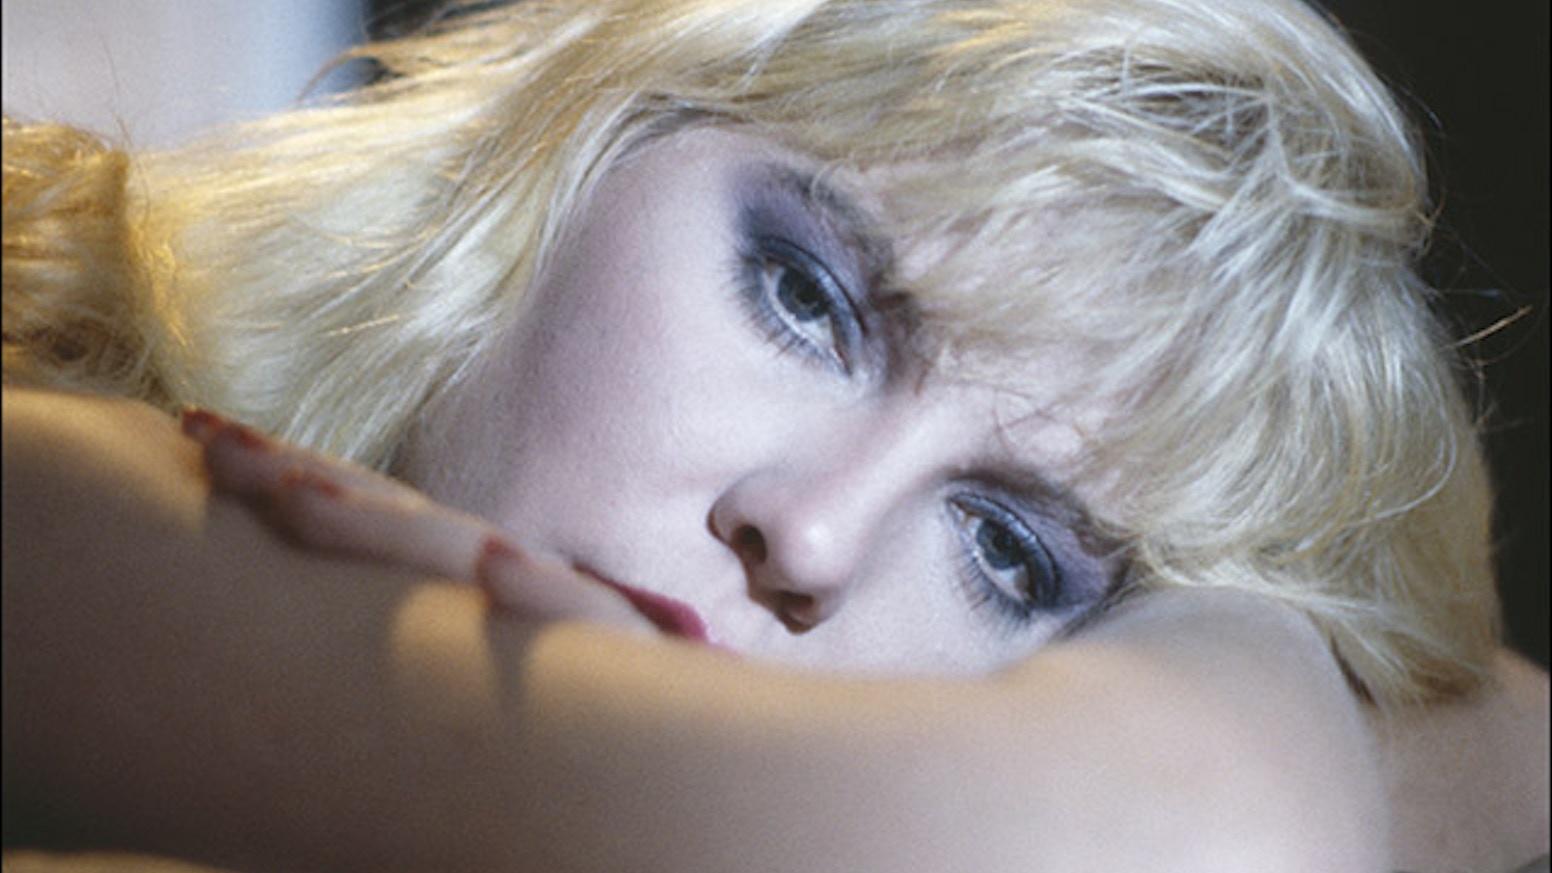 American Ecstasy Exhibition honoring Golden Age of Porn